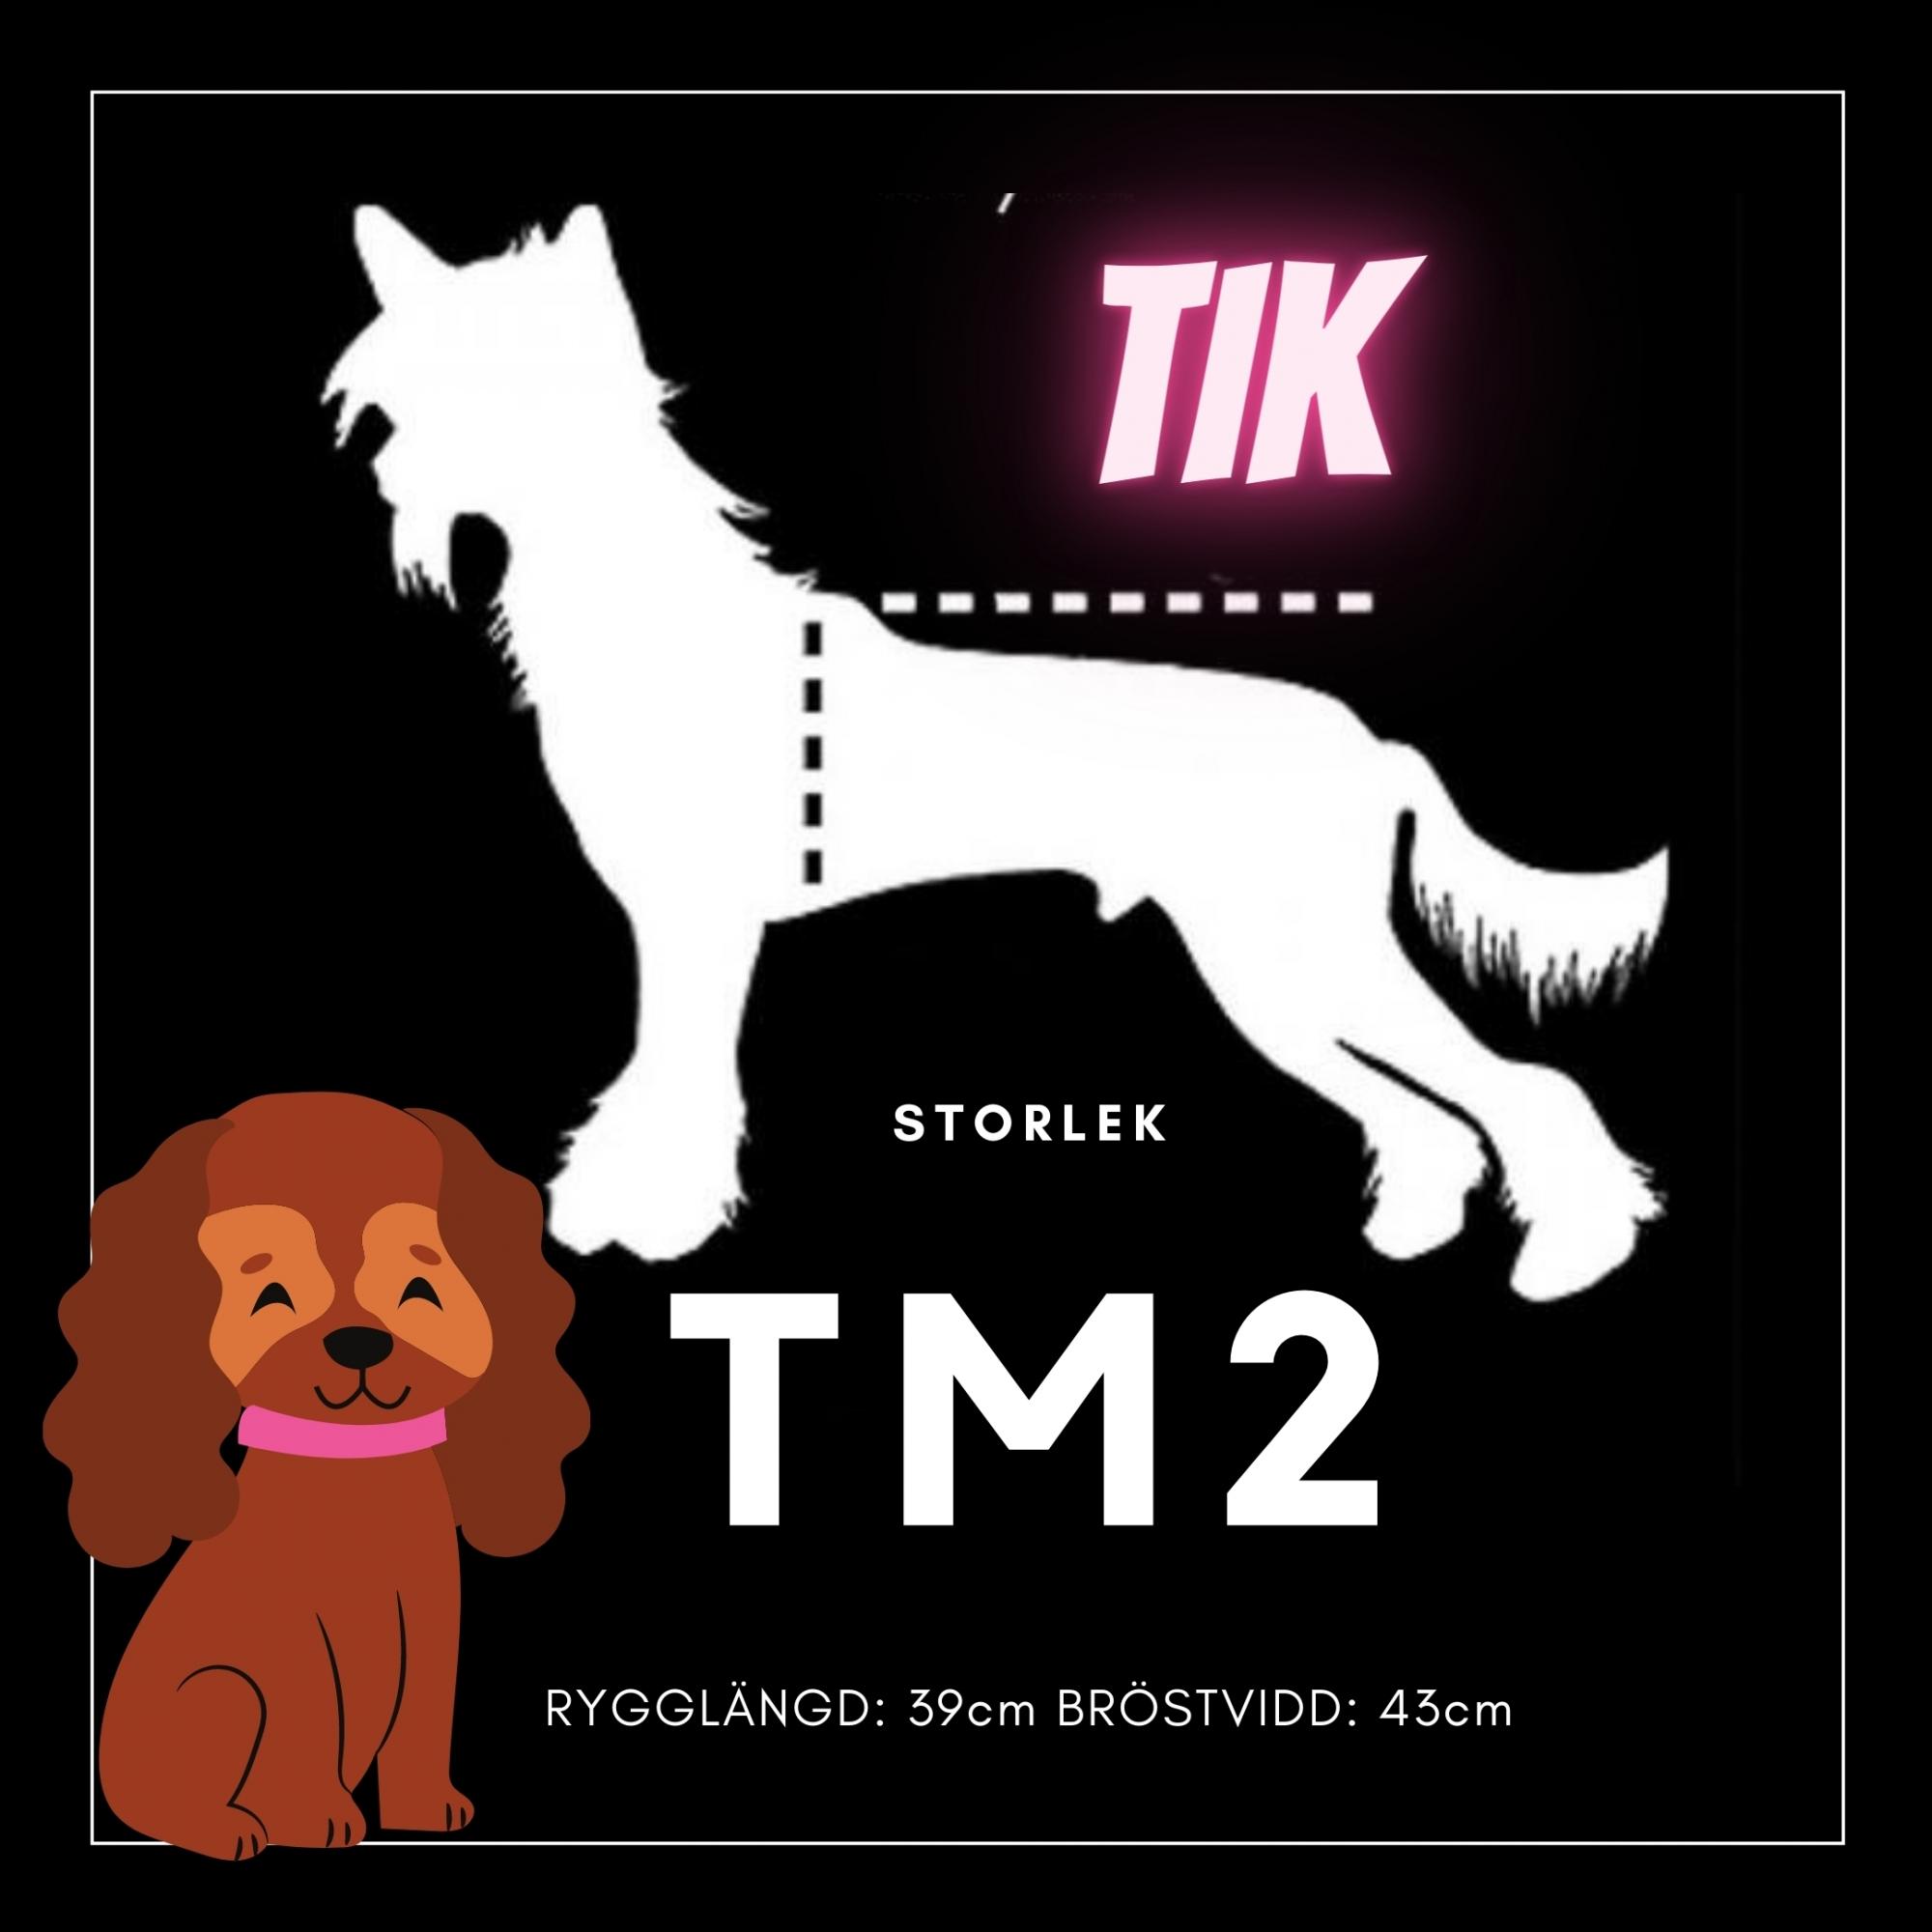 Tik Storlek TM2 - Passion For Pet Fashion